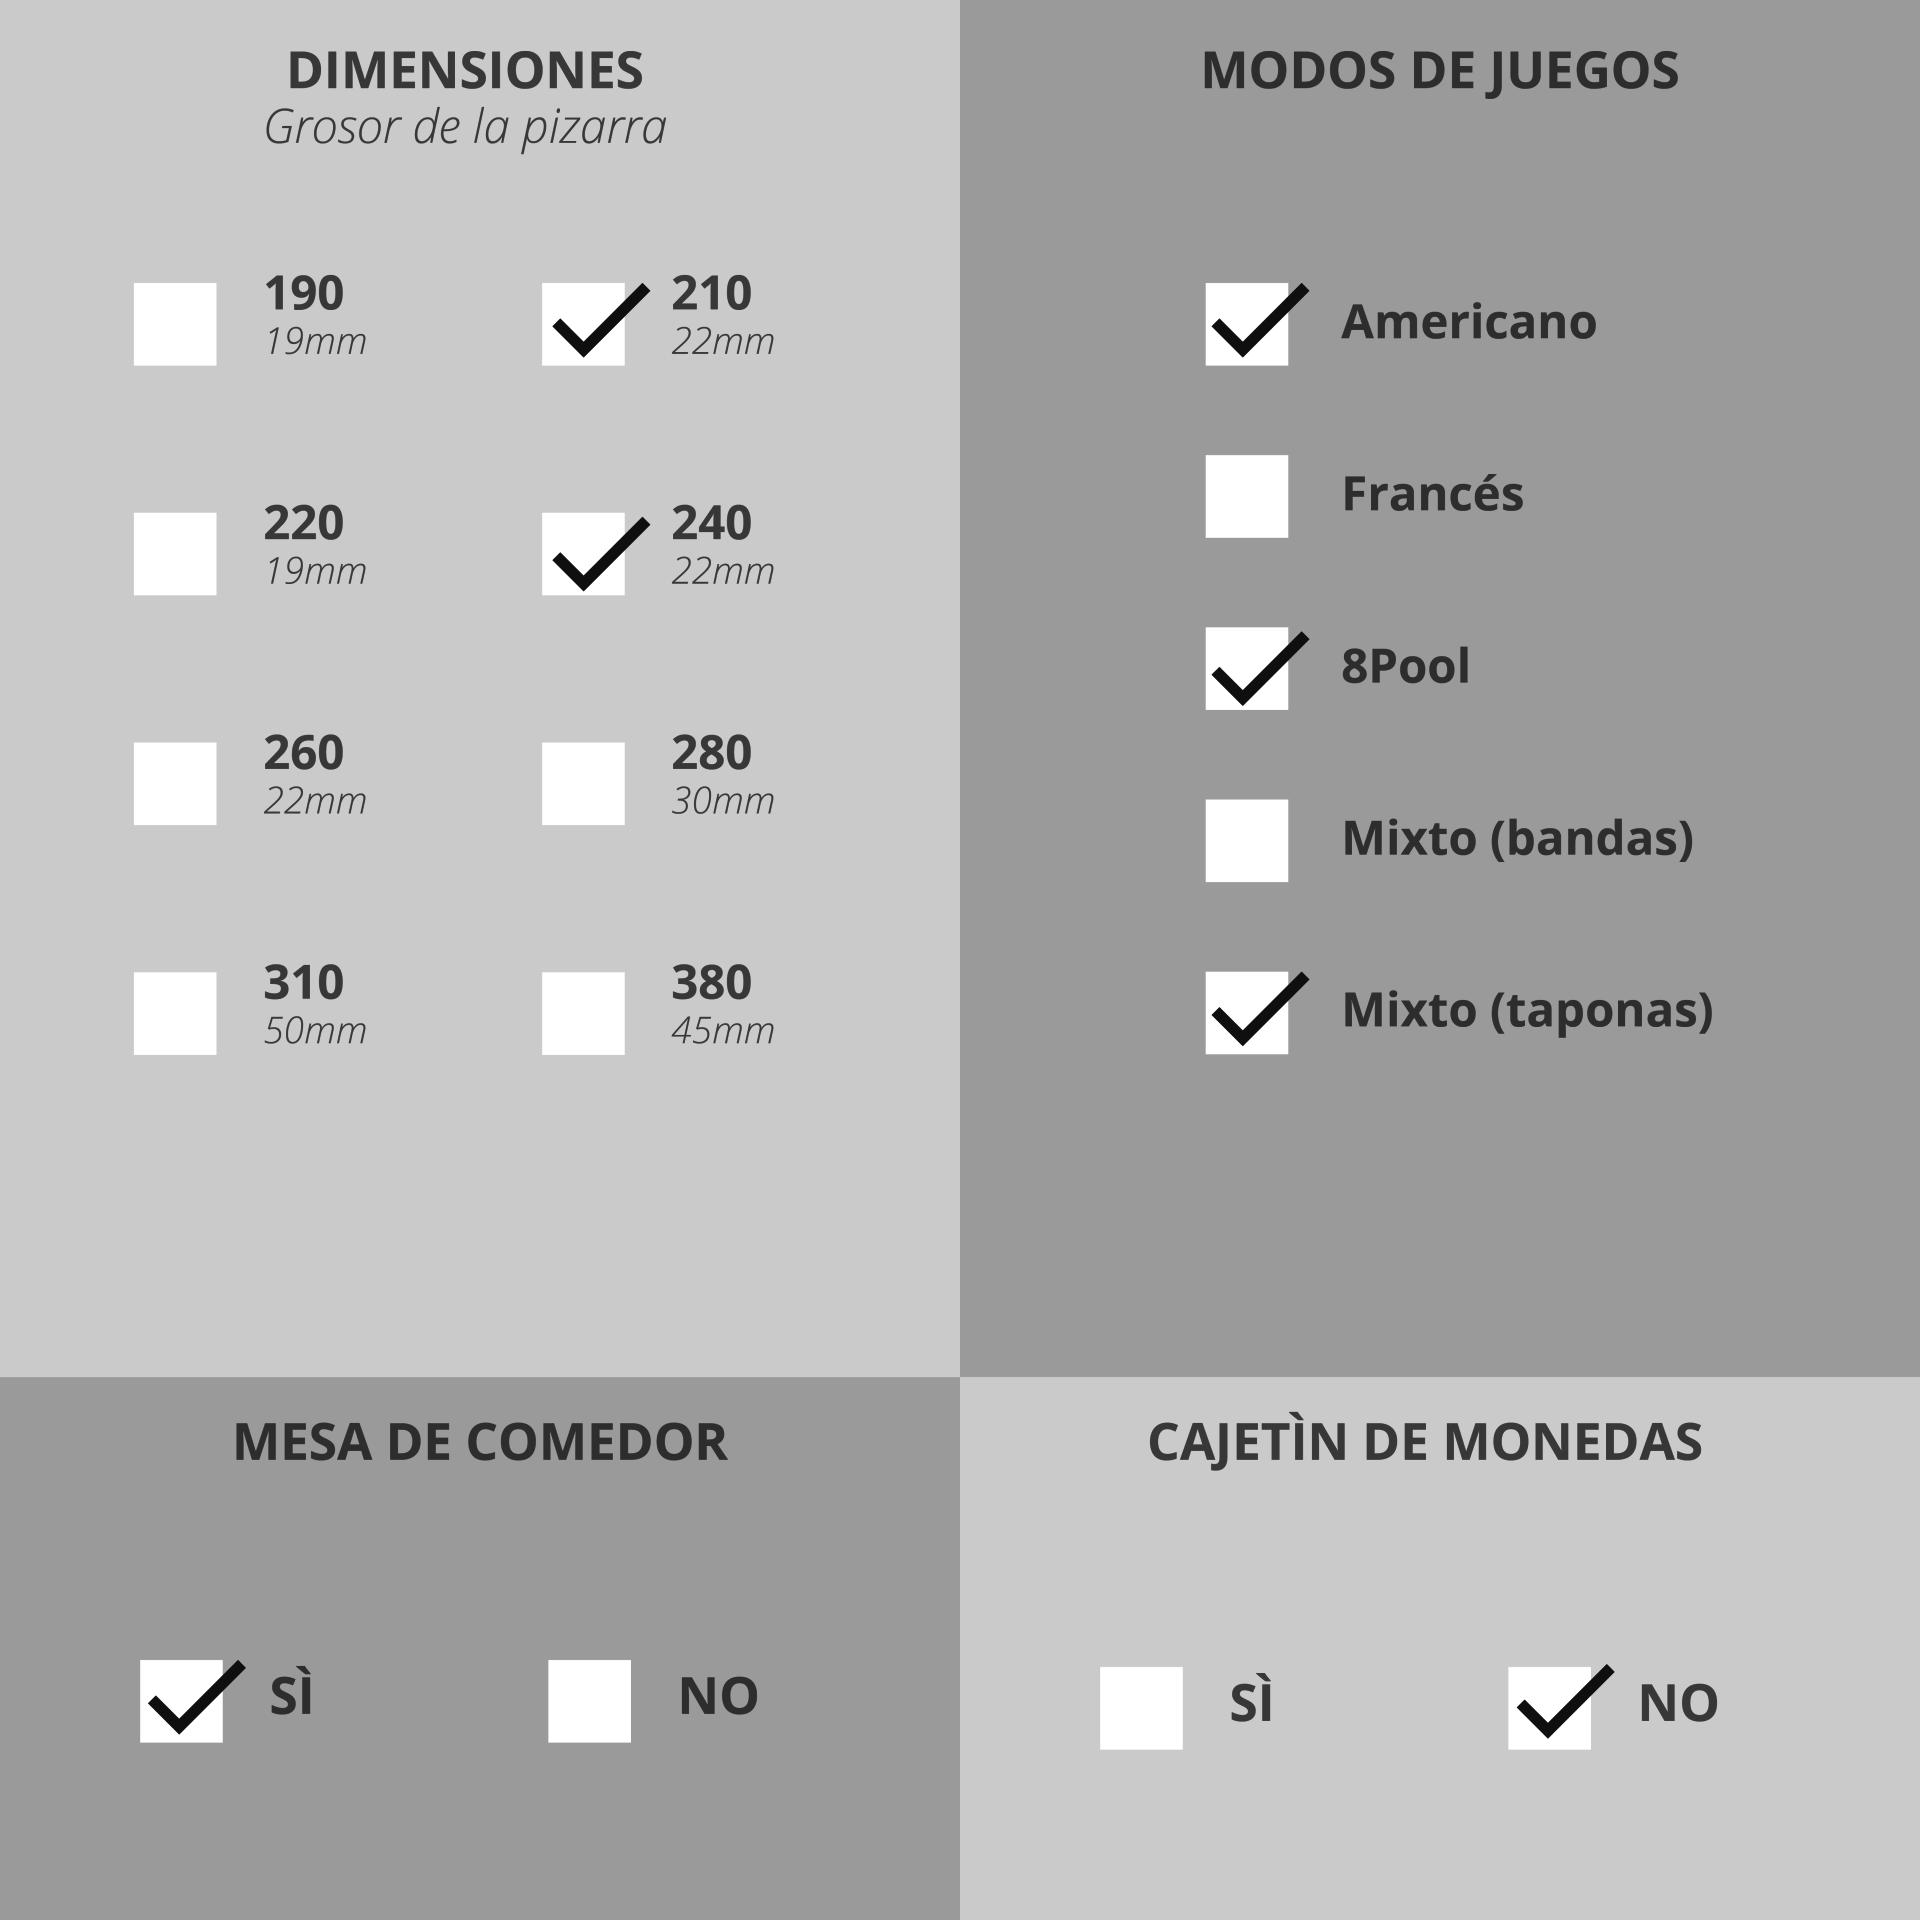 ES-BLACKLIGHT-Billards-Contemporain-Billards-Toulet-choix-des-options-01-01